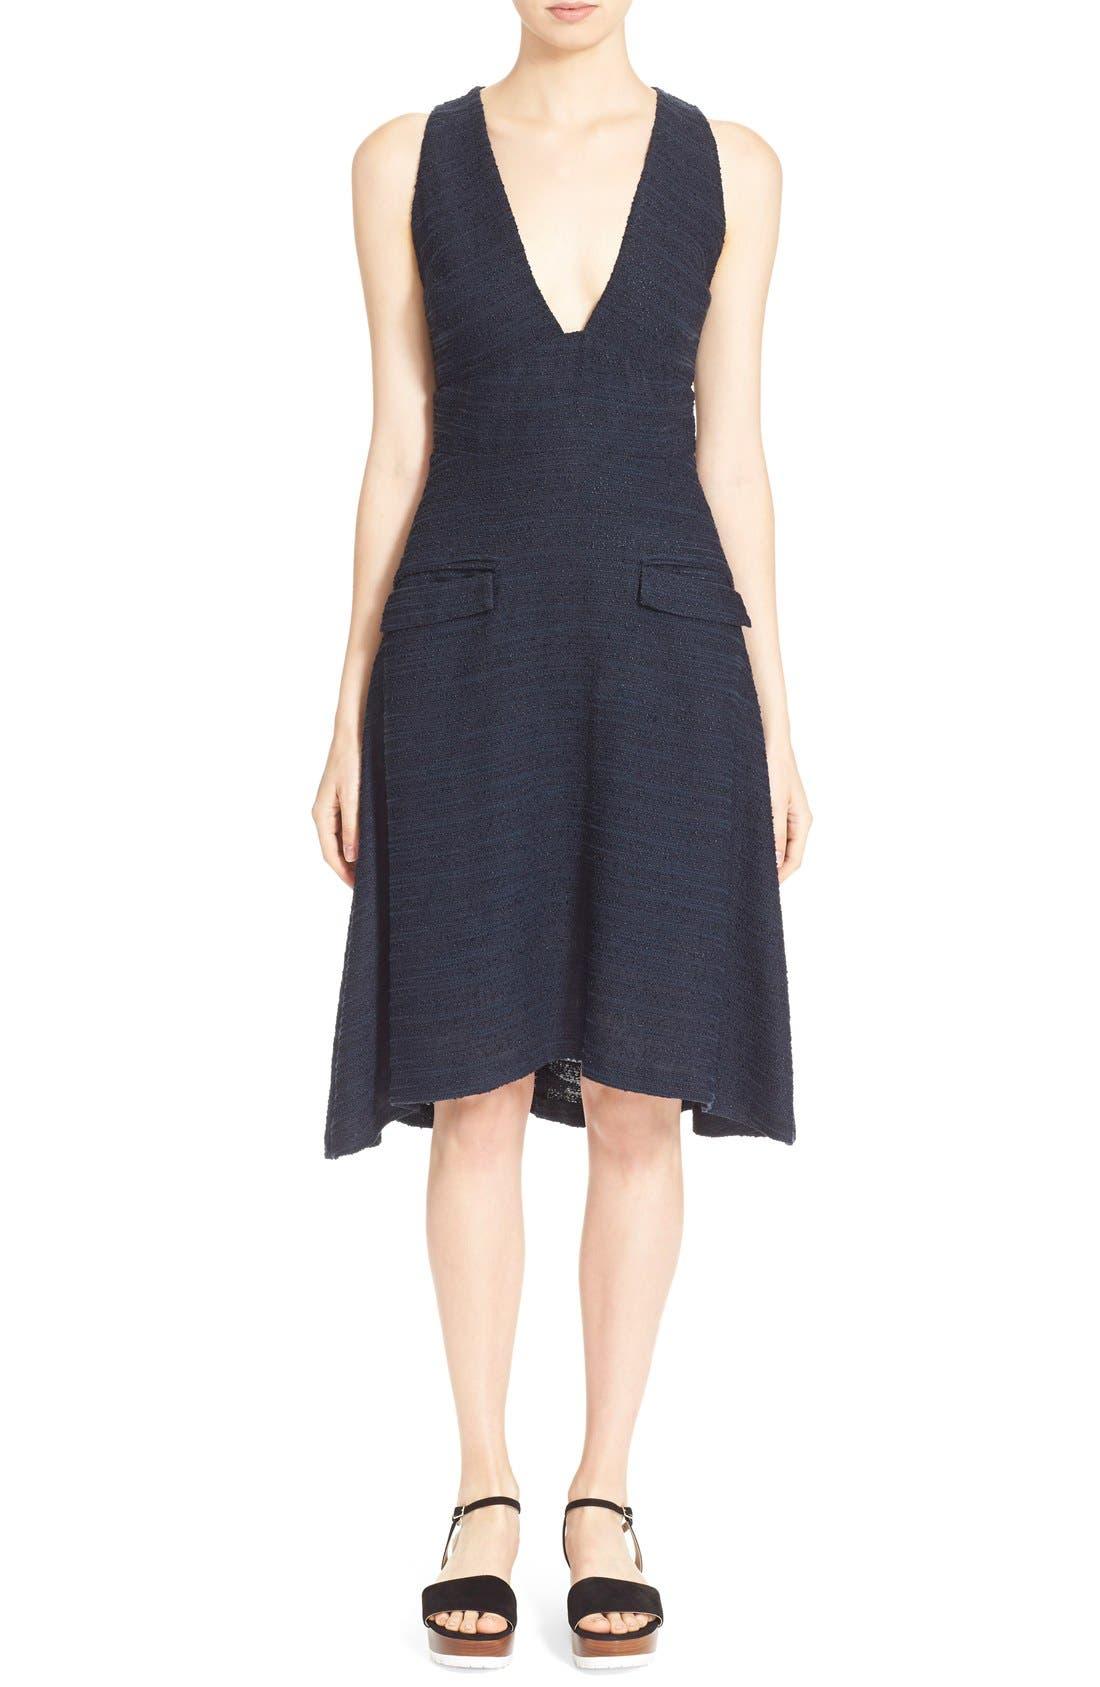 Alternate Image 1 Selected - A.L.C. 'Holland' Dress